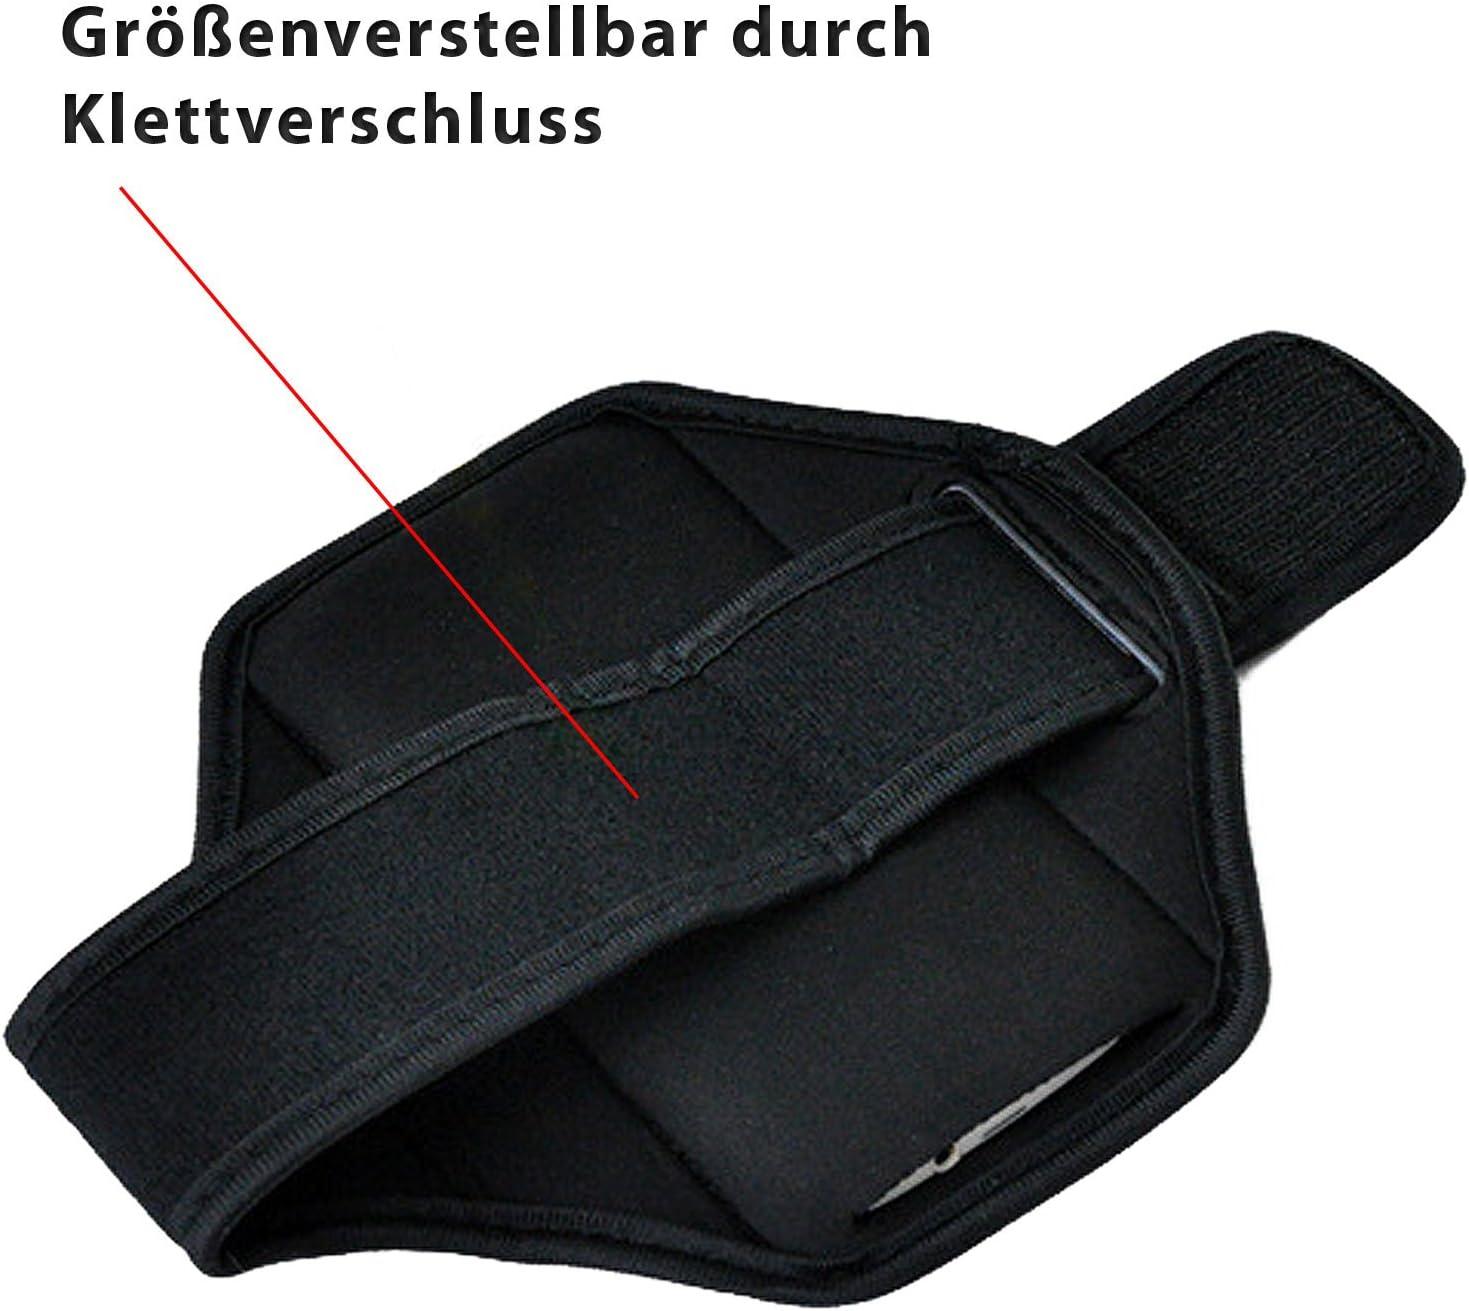 Sportarmband M EximMobile Armband Sportband schwarz Universelles Fitnessarmband passend f/ür Displays bis zu 5 Zoll   Handyarmband Laufen Oberarmtasche Joggen Folie f/ür HTC One Mini 2